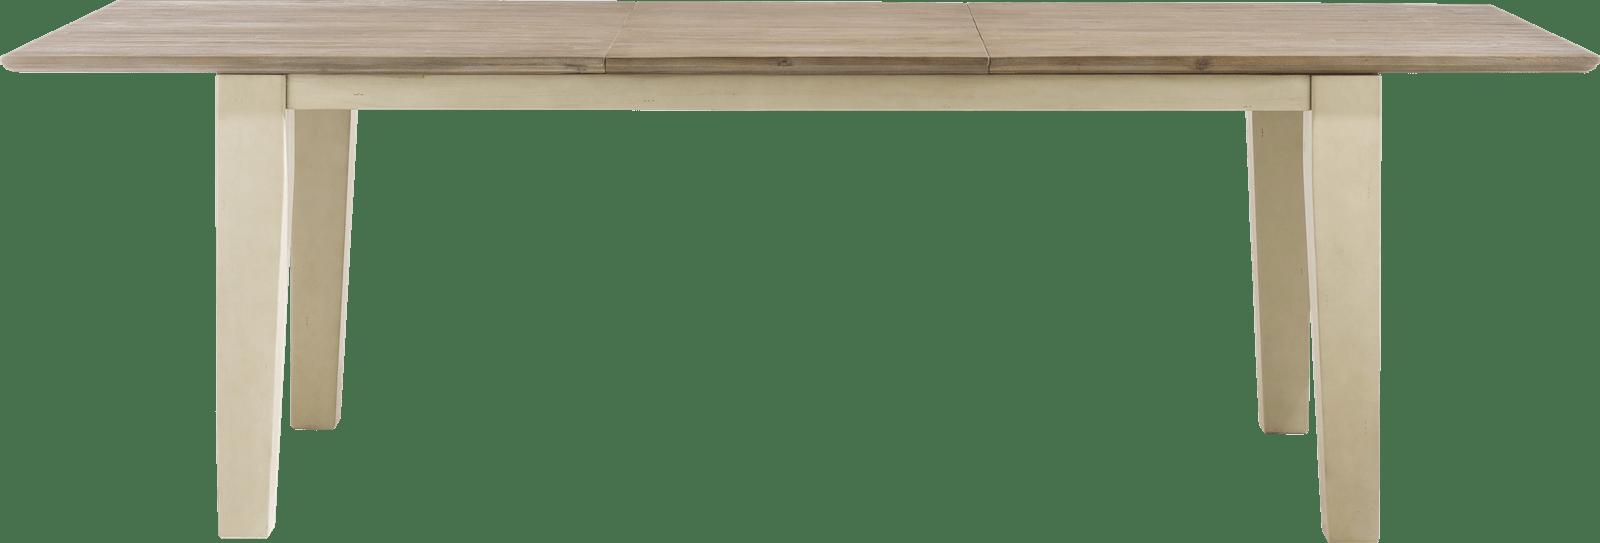 Le Port - ausziehtisch 160 (+ 60) x 100 cm